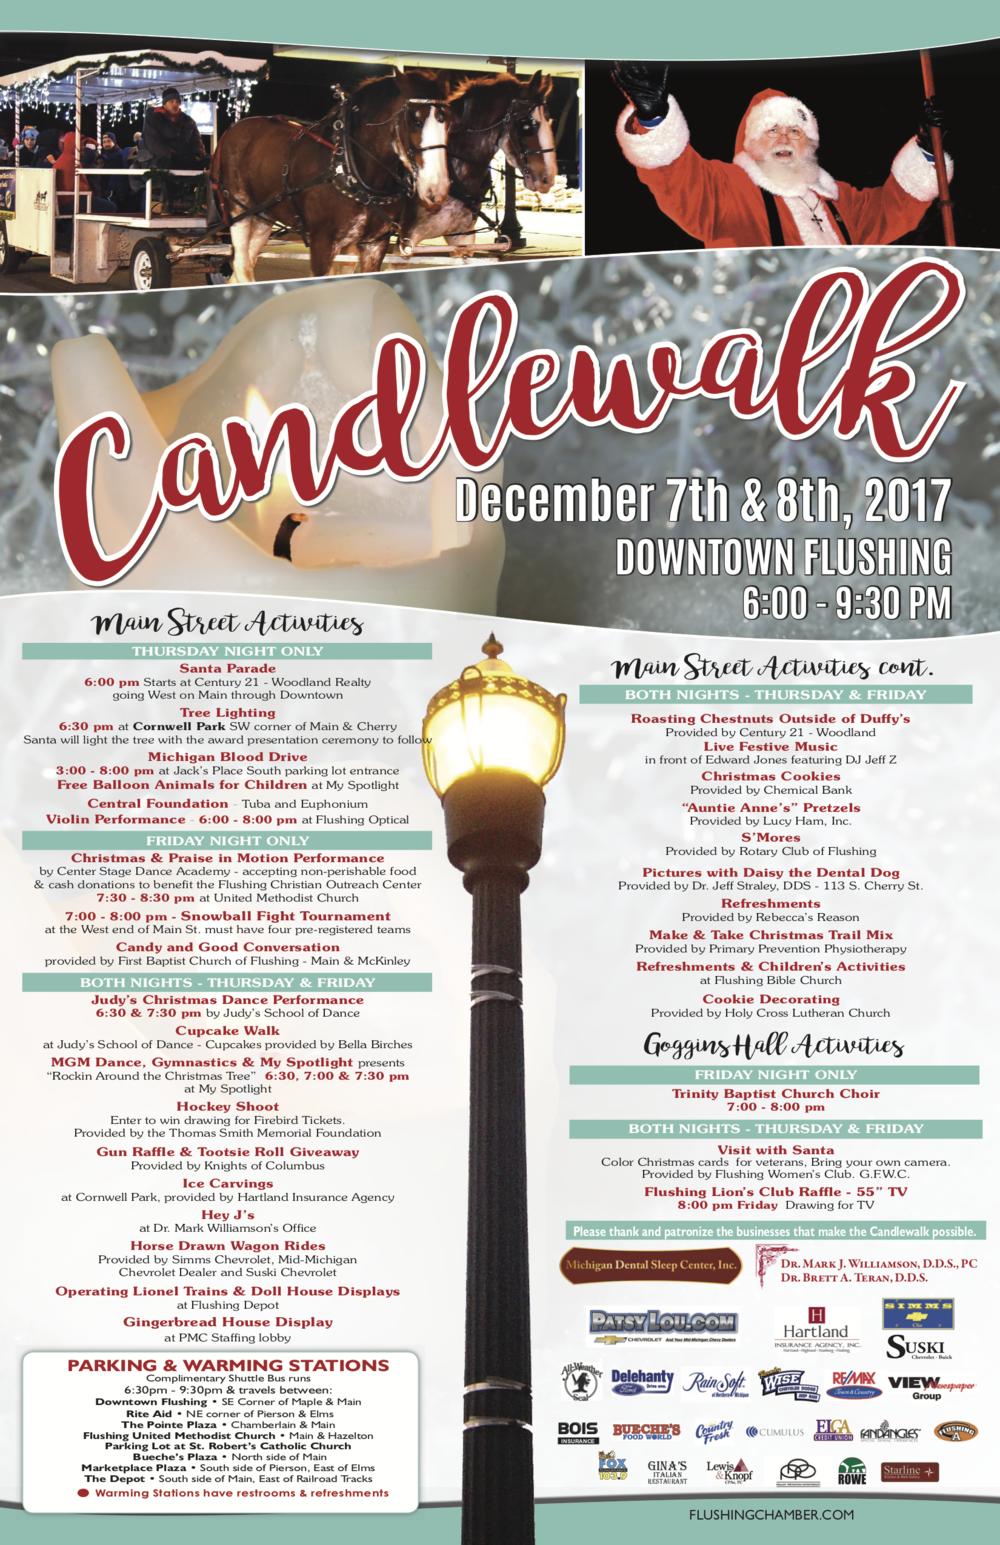 candlewalk-poster-5-2018.png